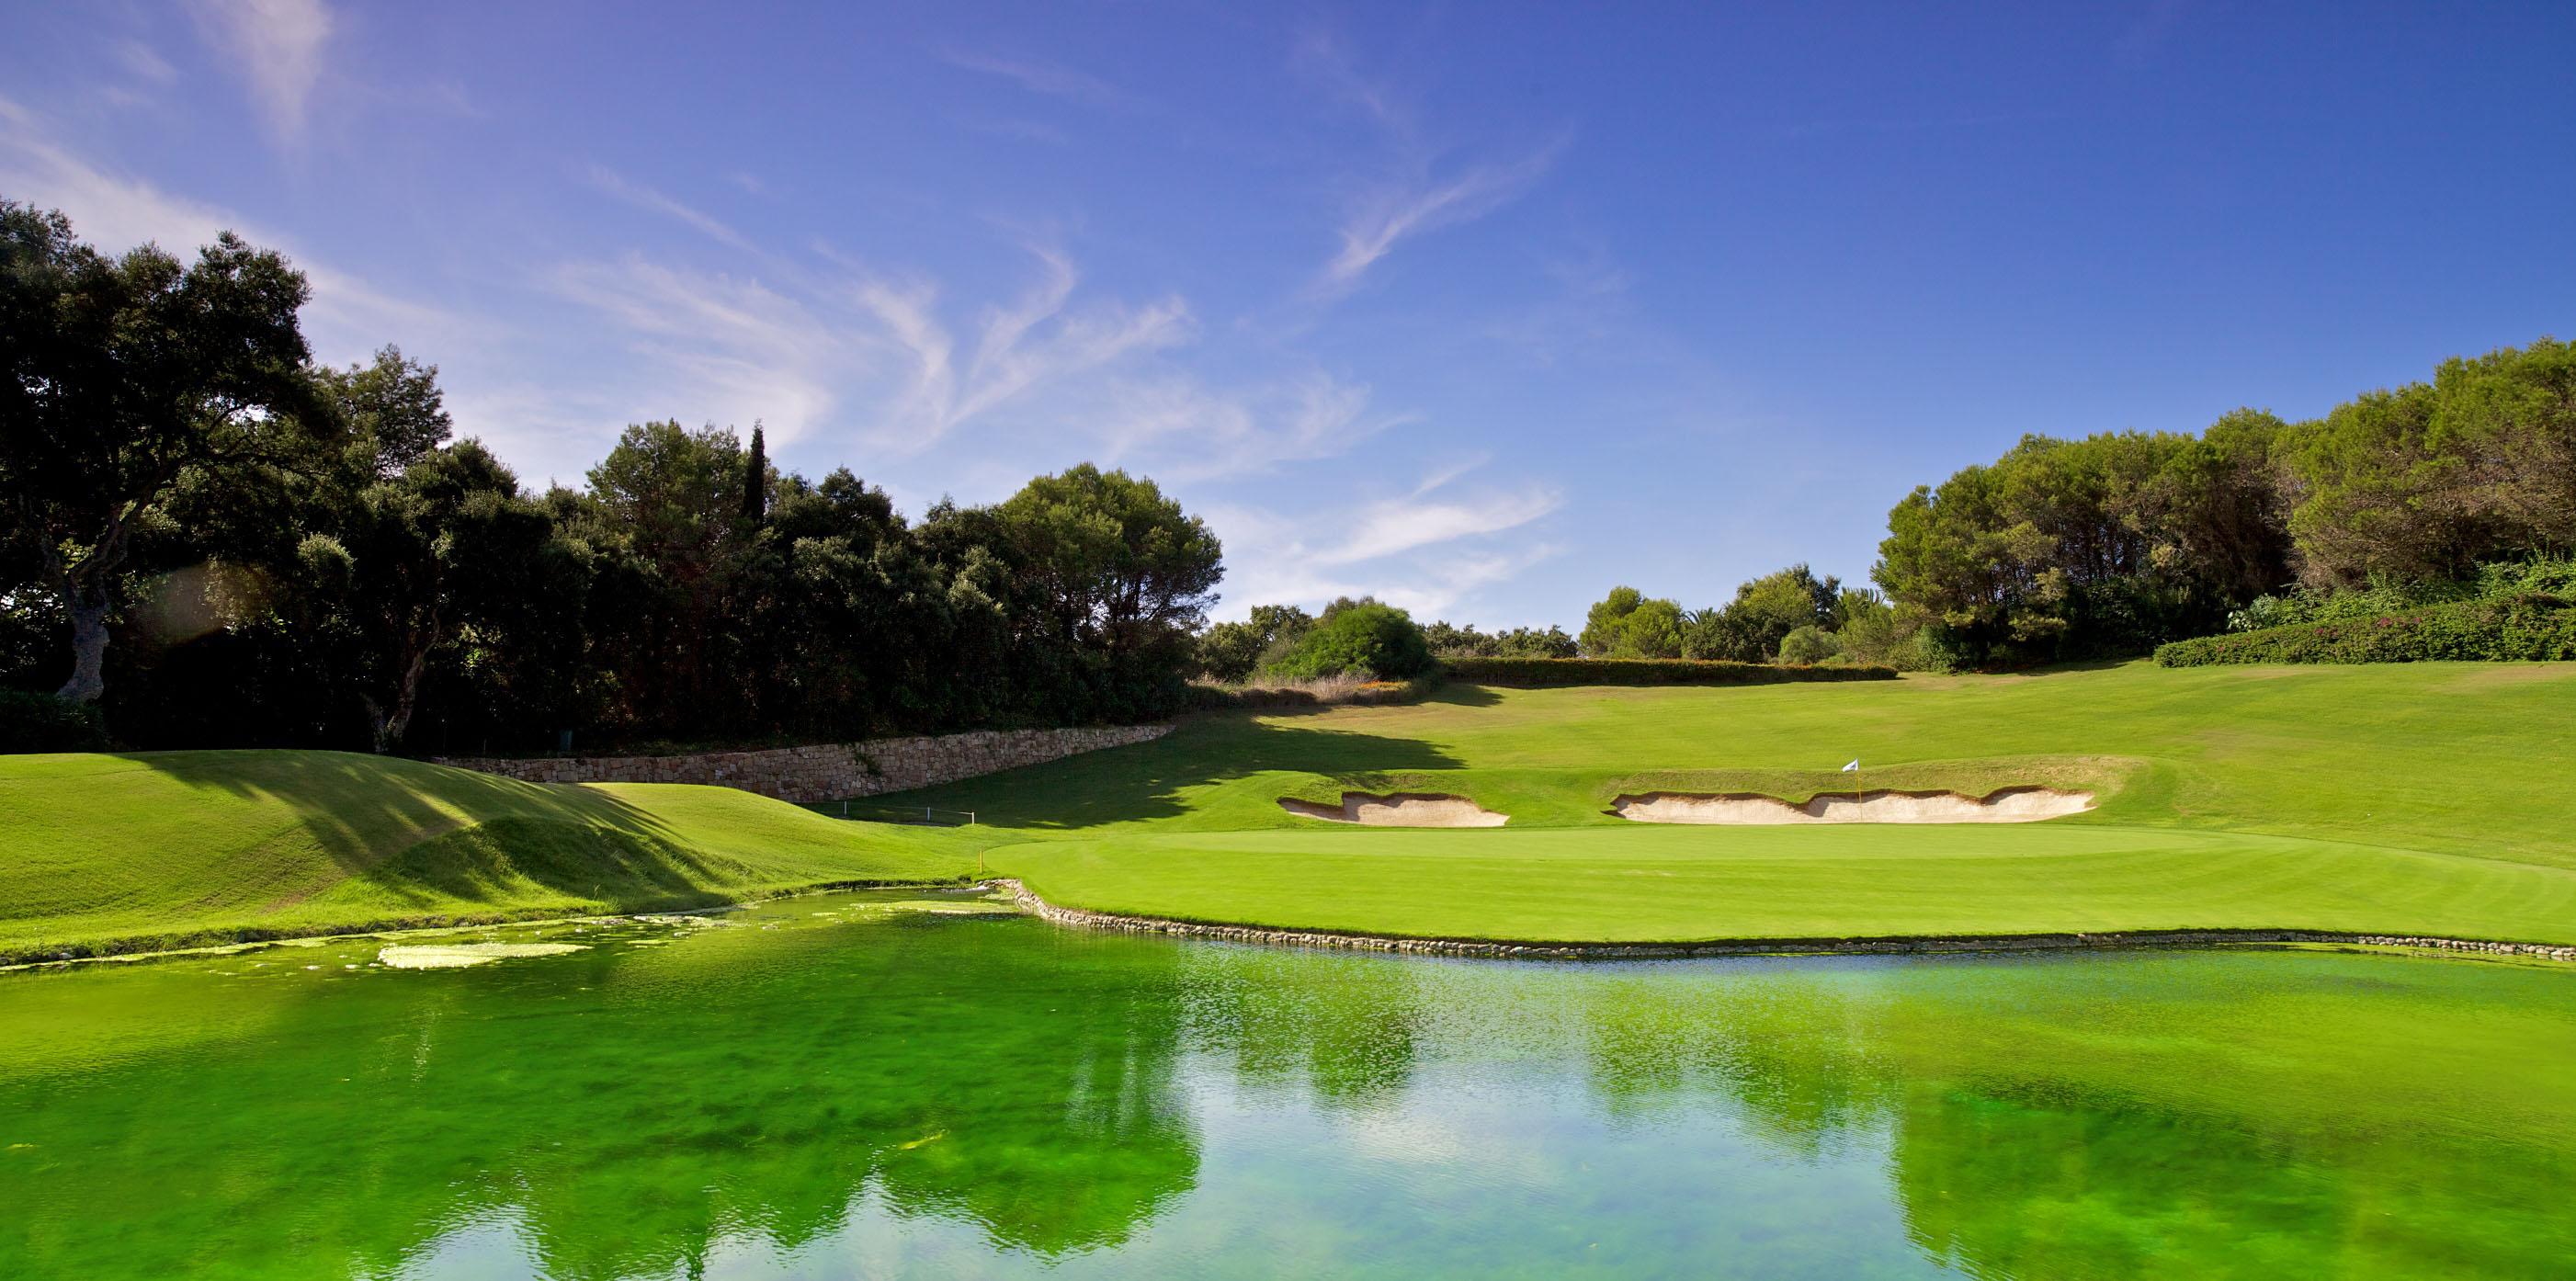 The 17th Hole at Valderrama © Golffoto.es